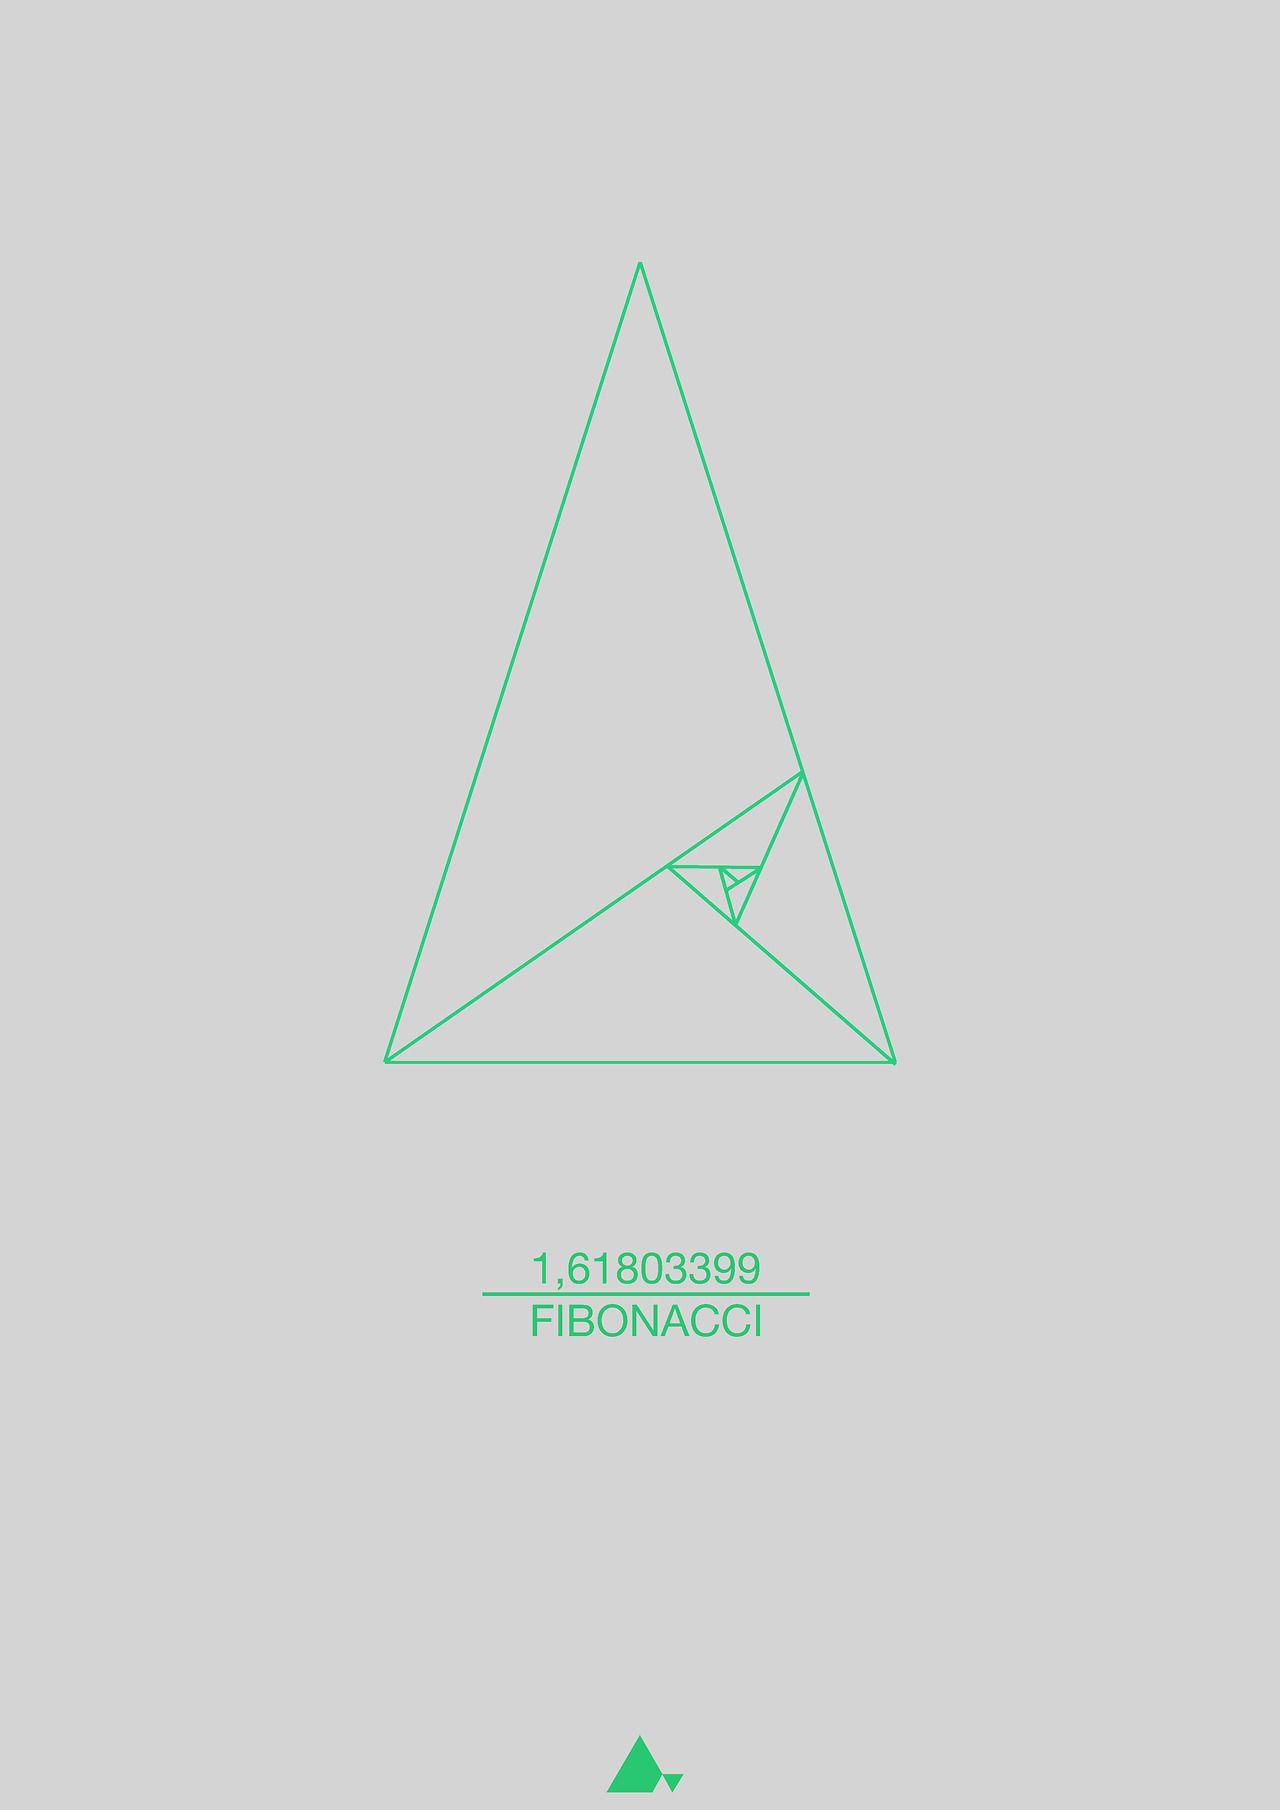 fibonacci sequence triangle print 60x80 cm fibonacci italian mathematician of the 12th. Black Bedroom Furniture Sets. Home Design Ideas